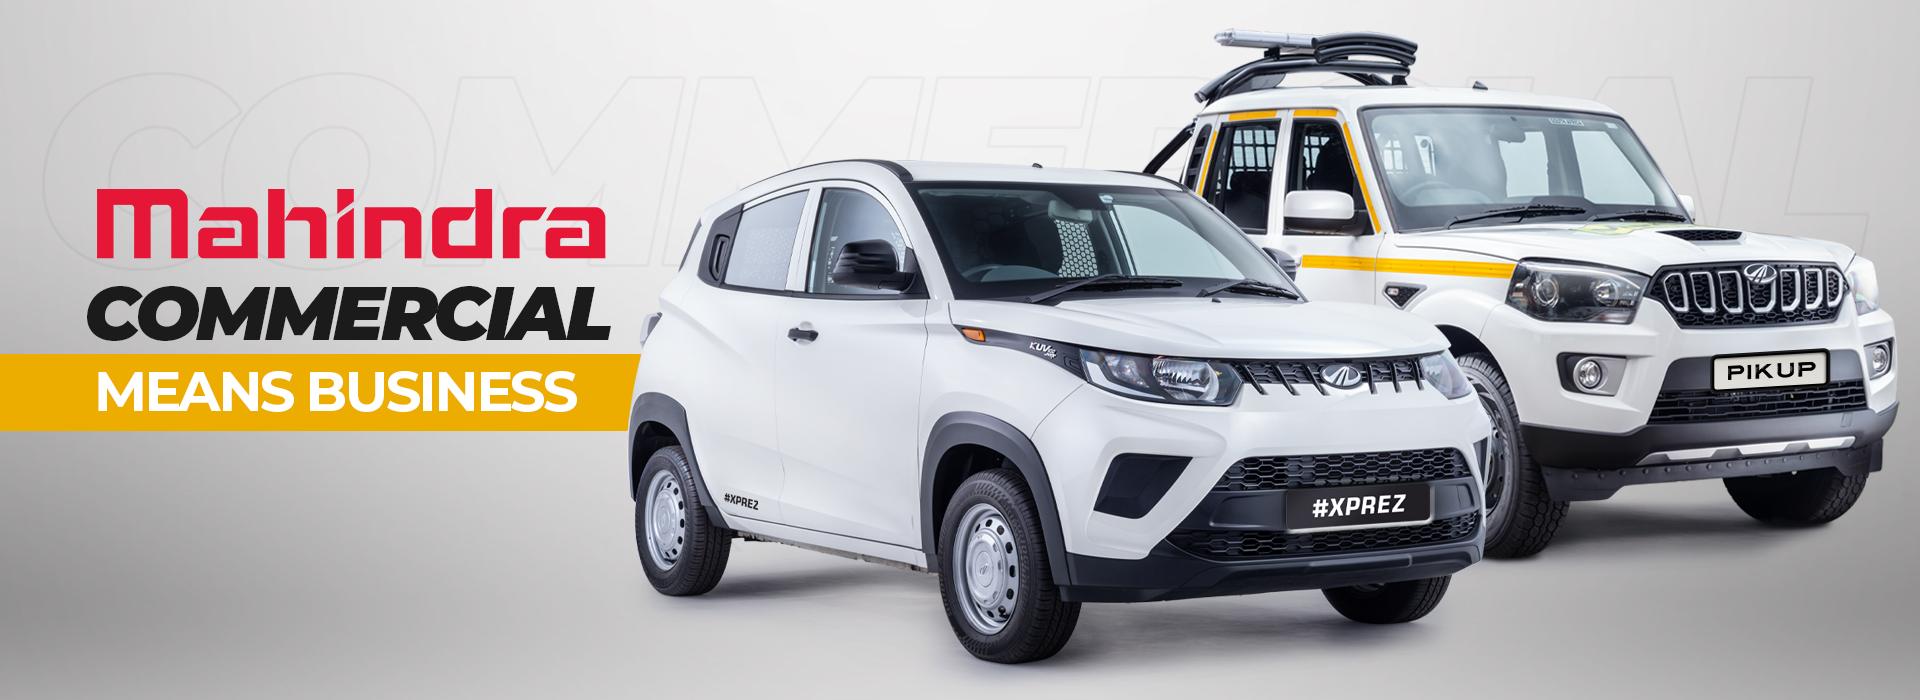 Mahindra Specialised Vehicles Bloemfontein